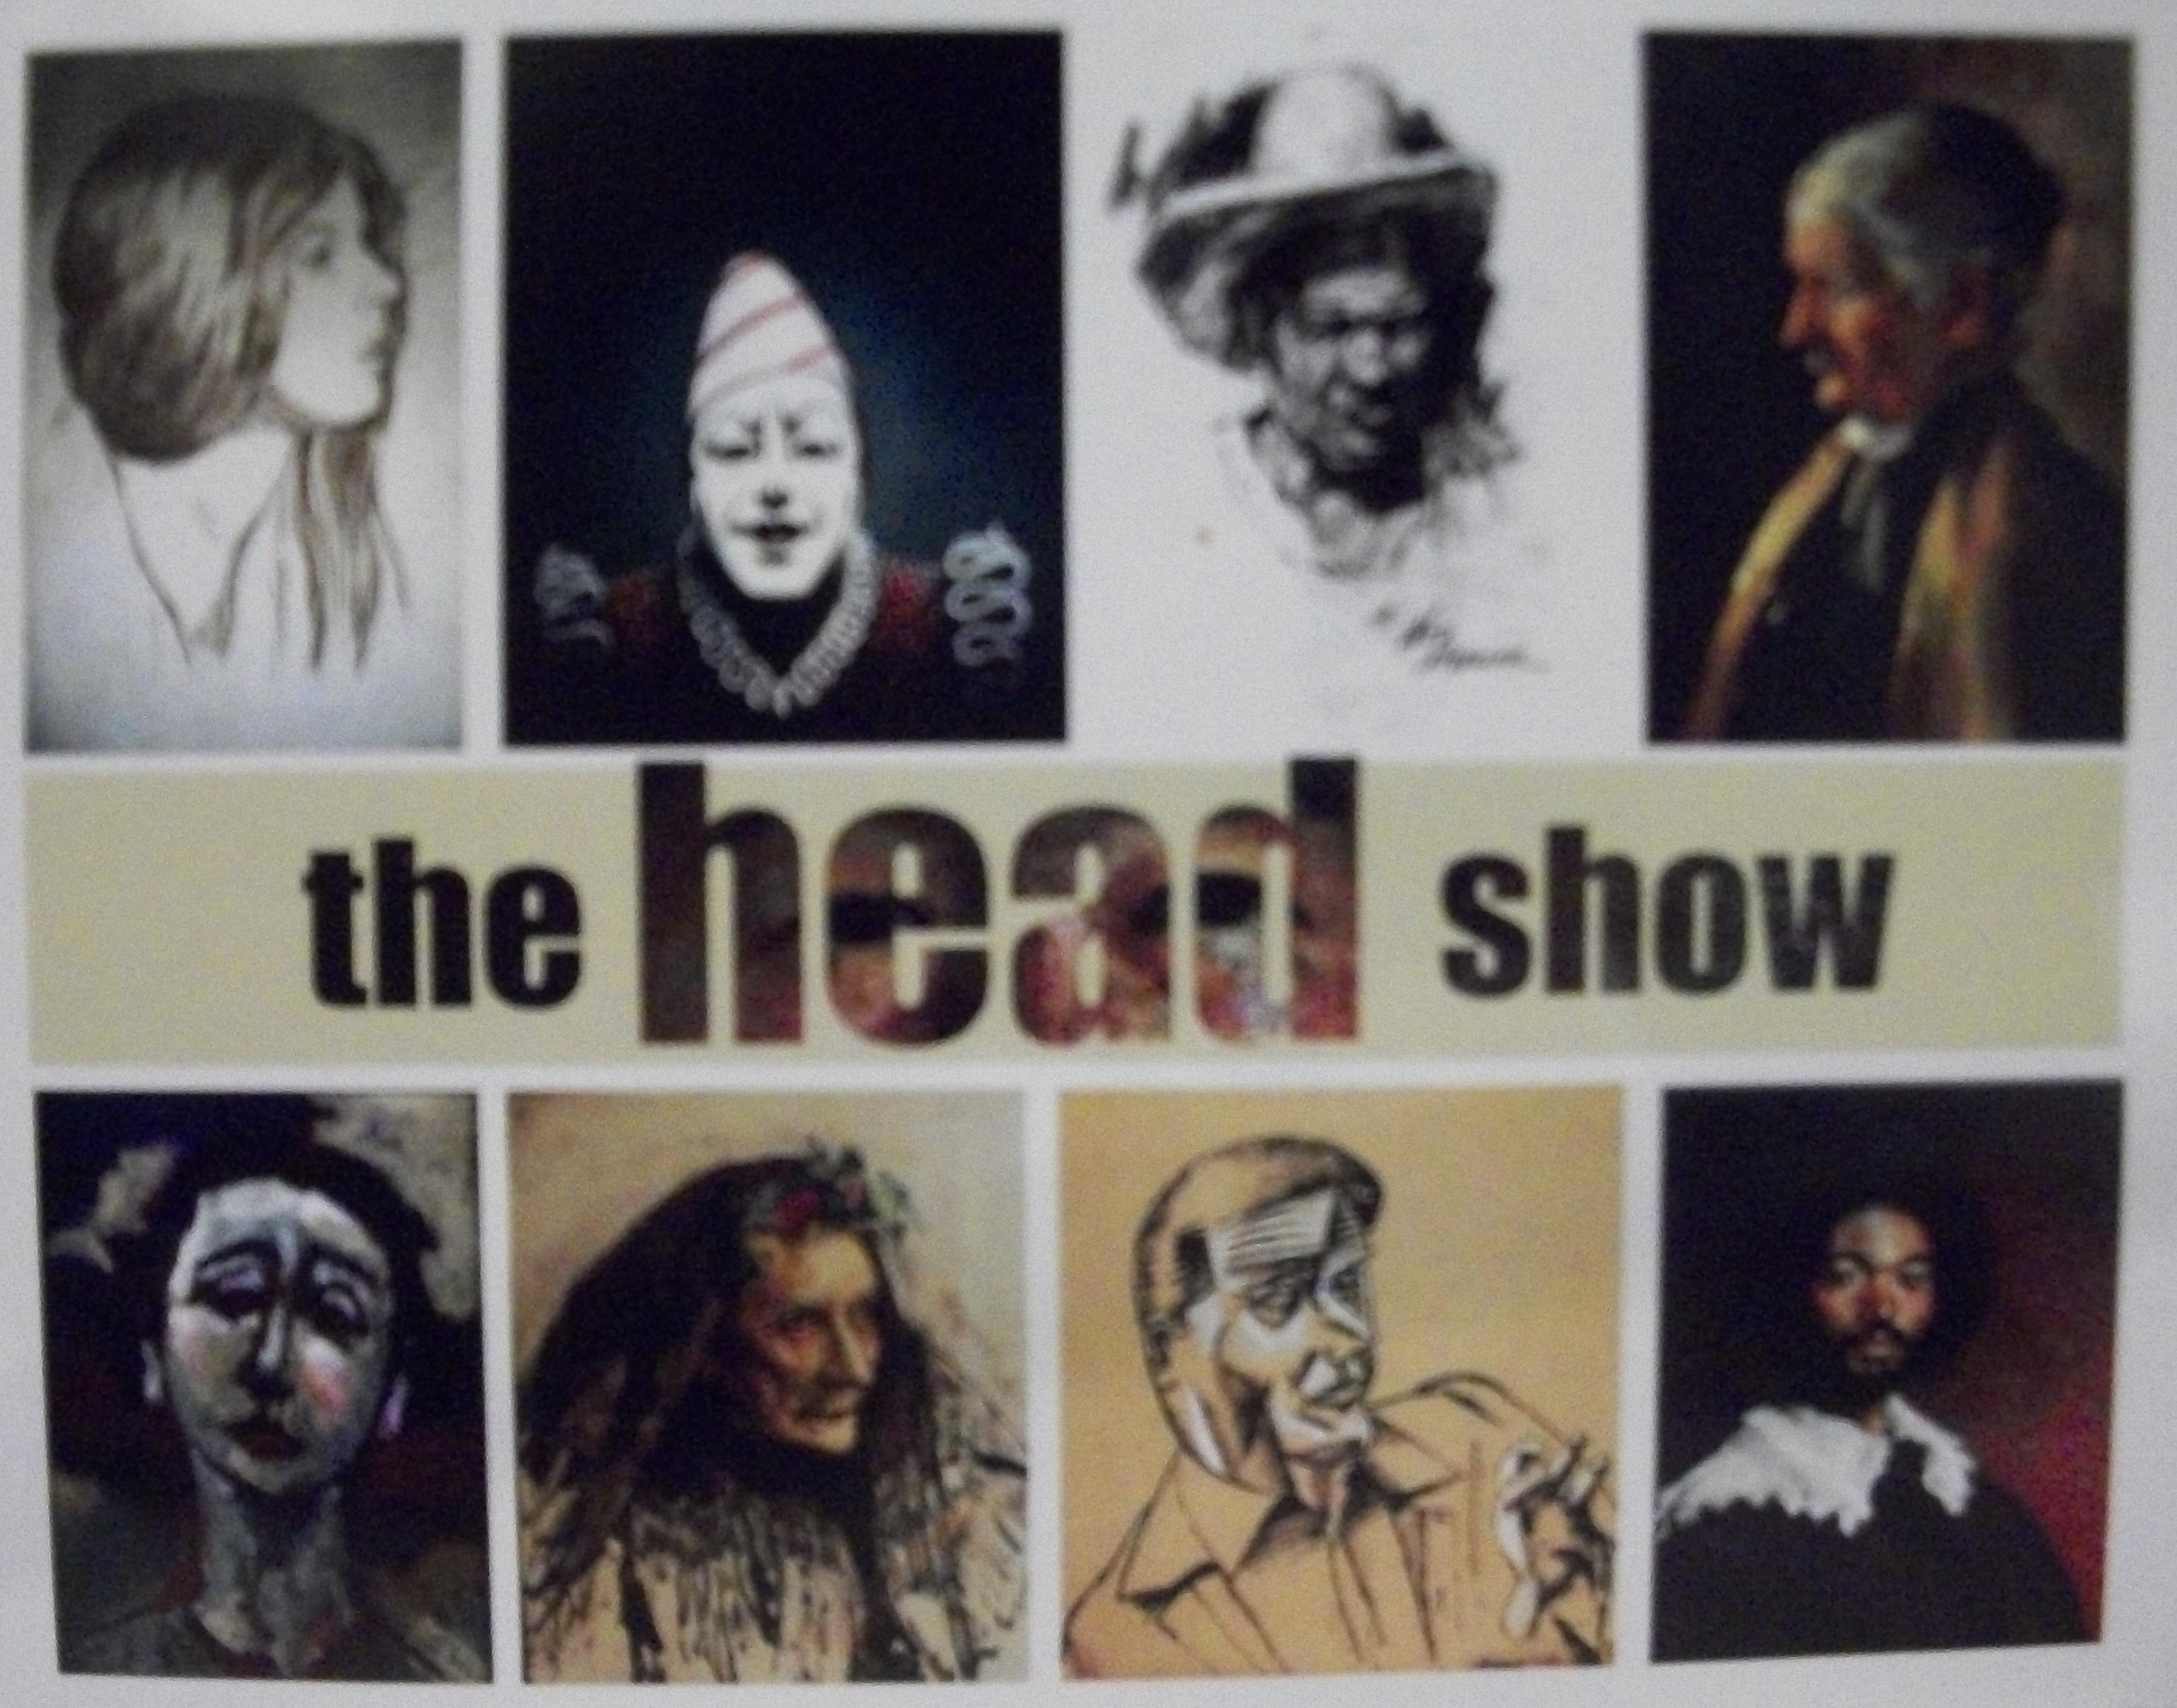 the head show 7 2011 012